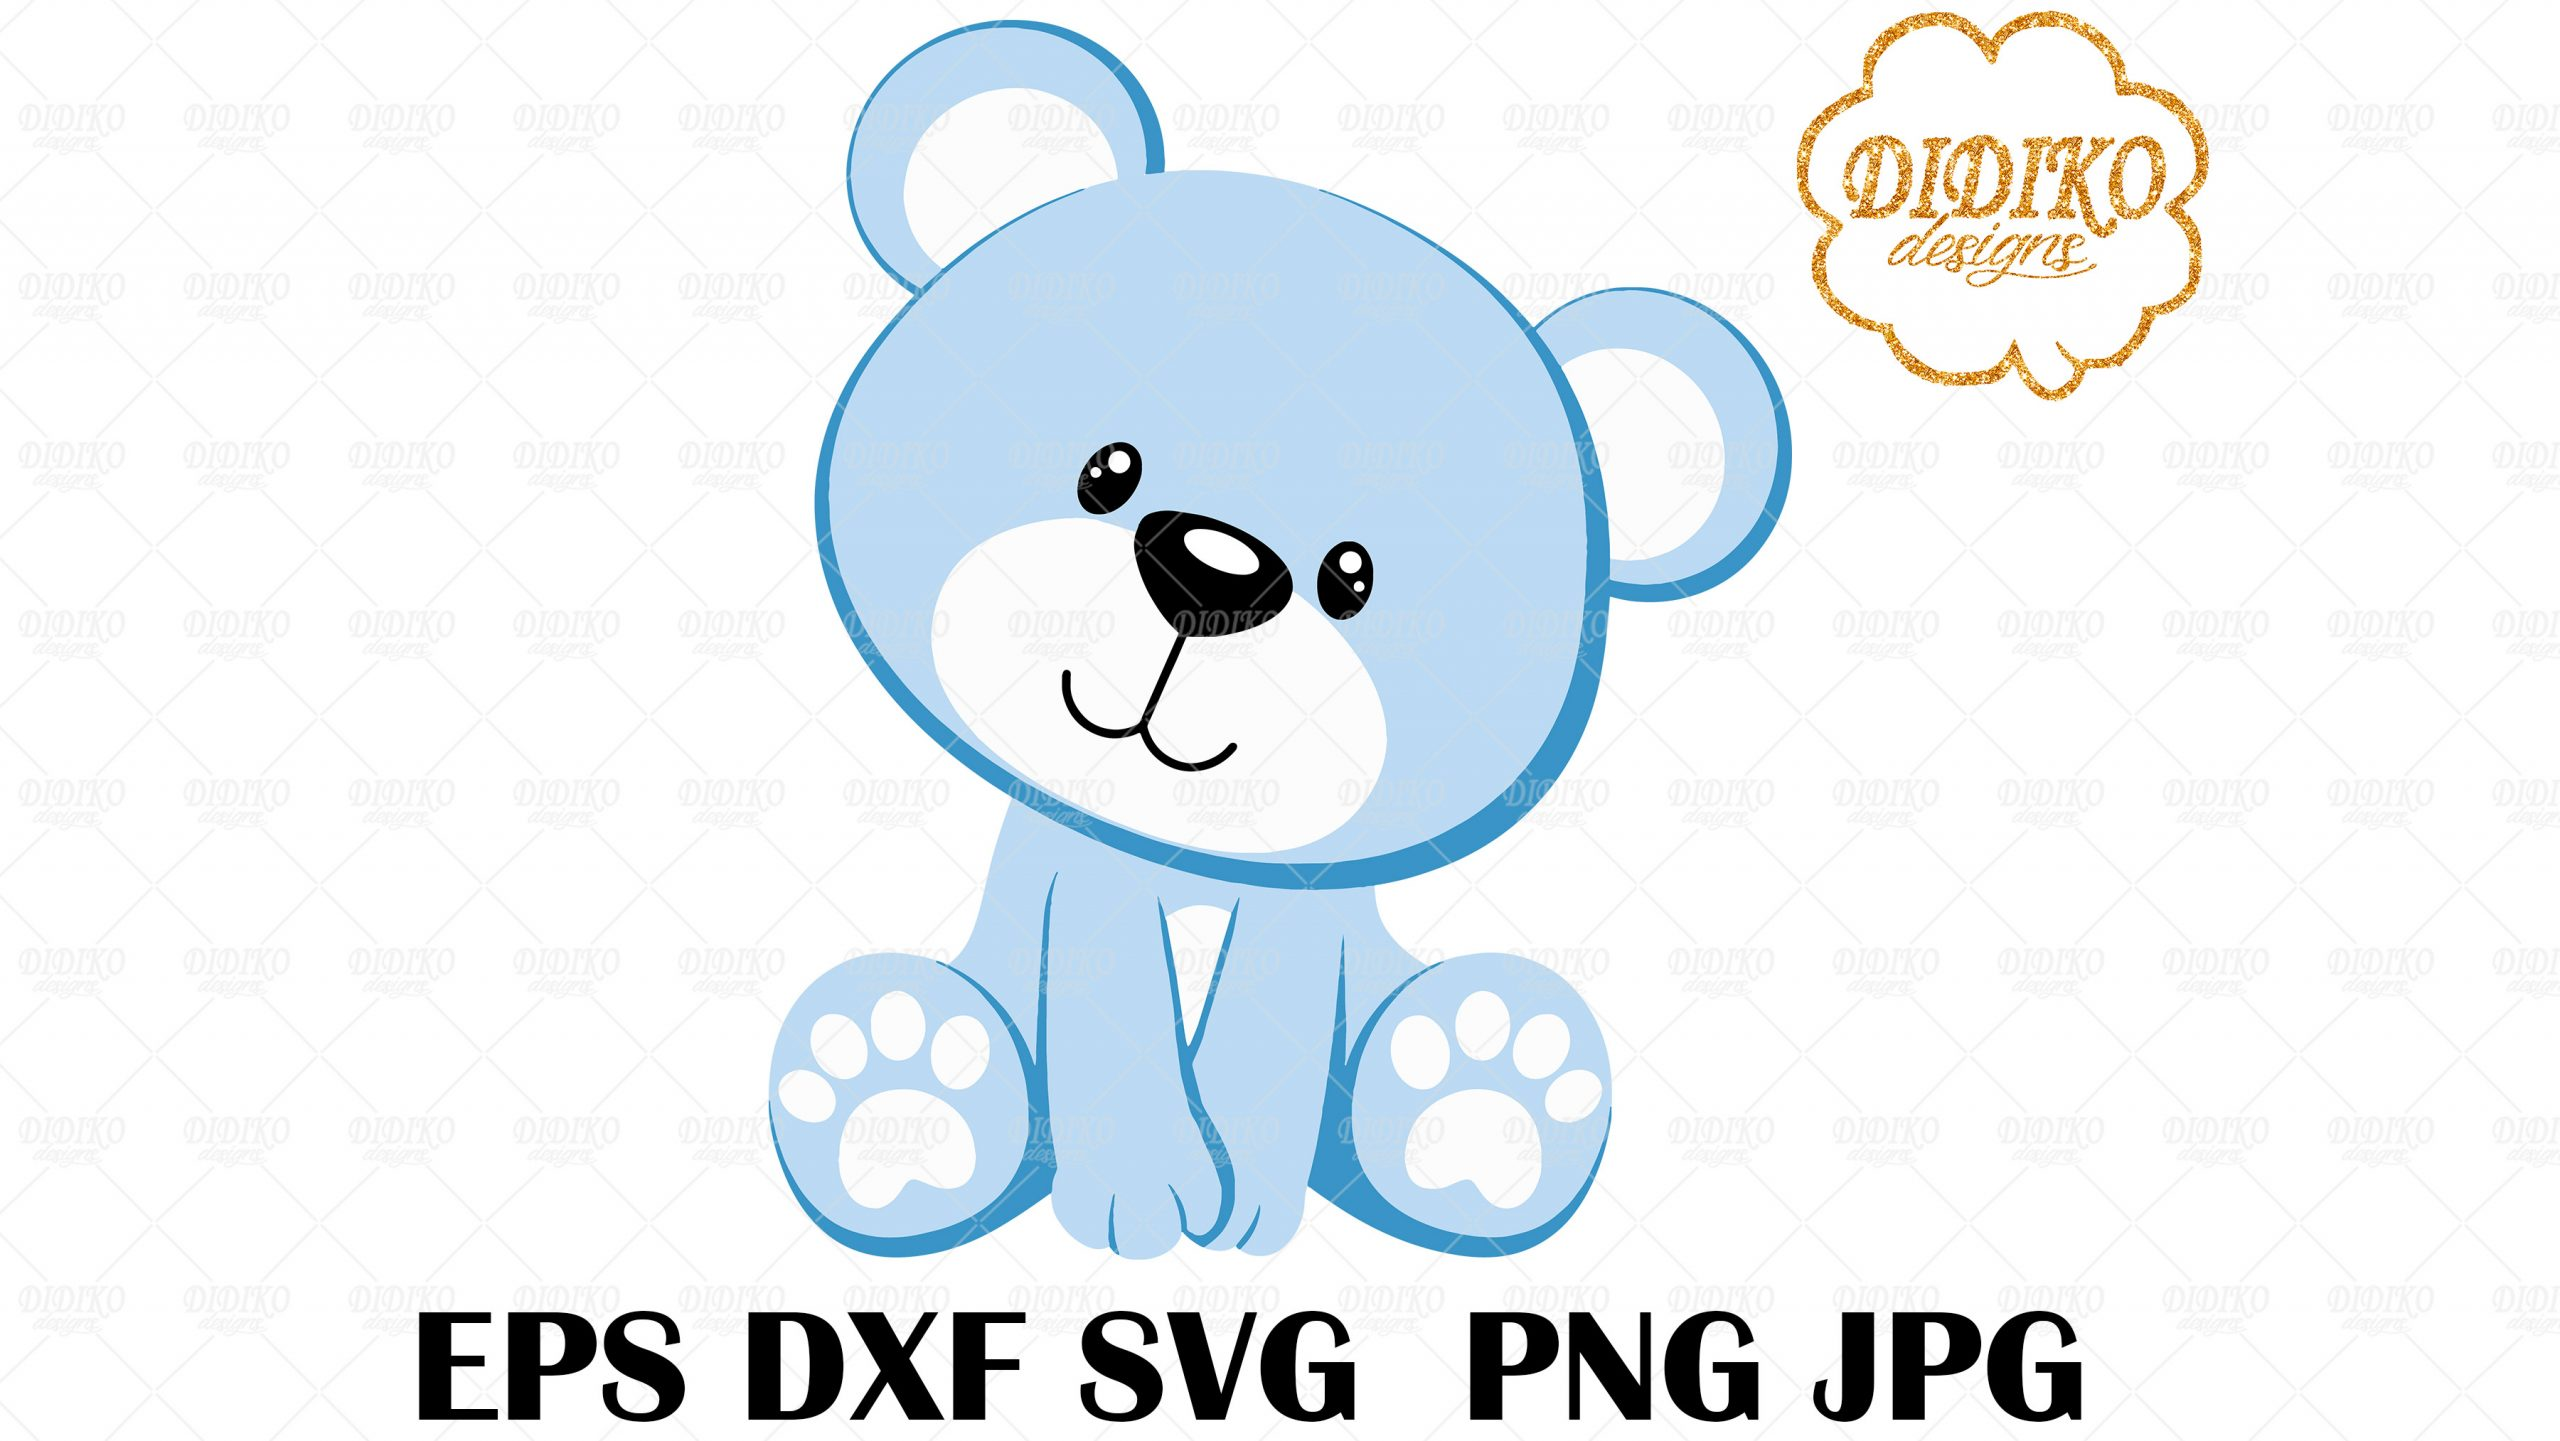 Teddy Bear Svg Baby Blue Bear Svg Bear Vector File Cricut File Silhoutte Didiko Designs